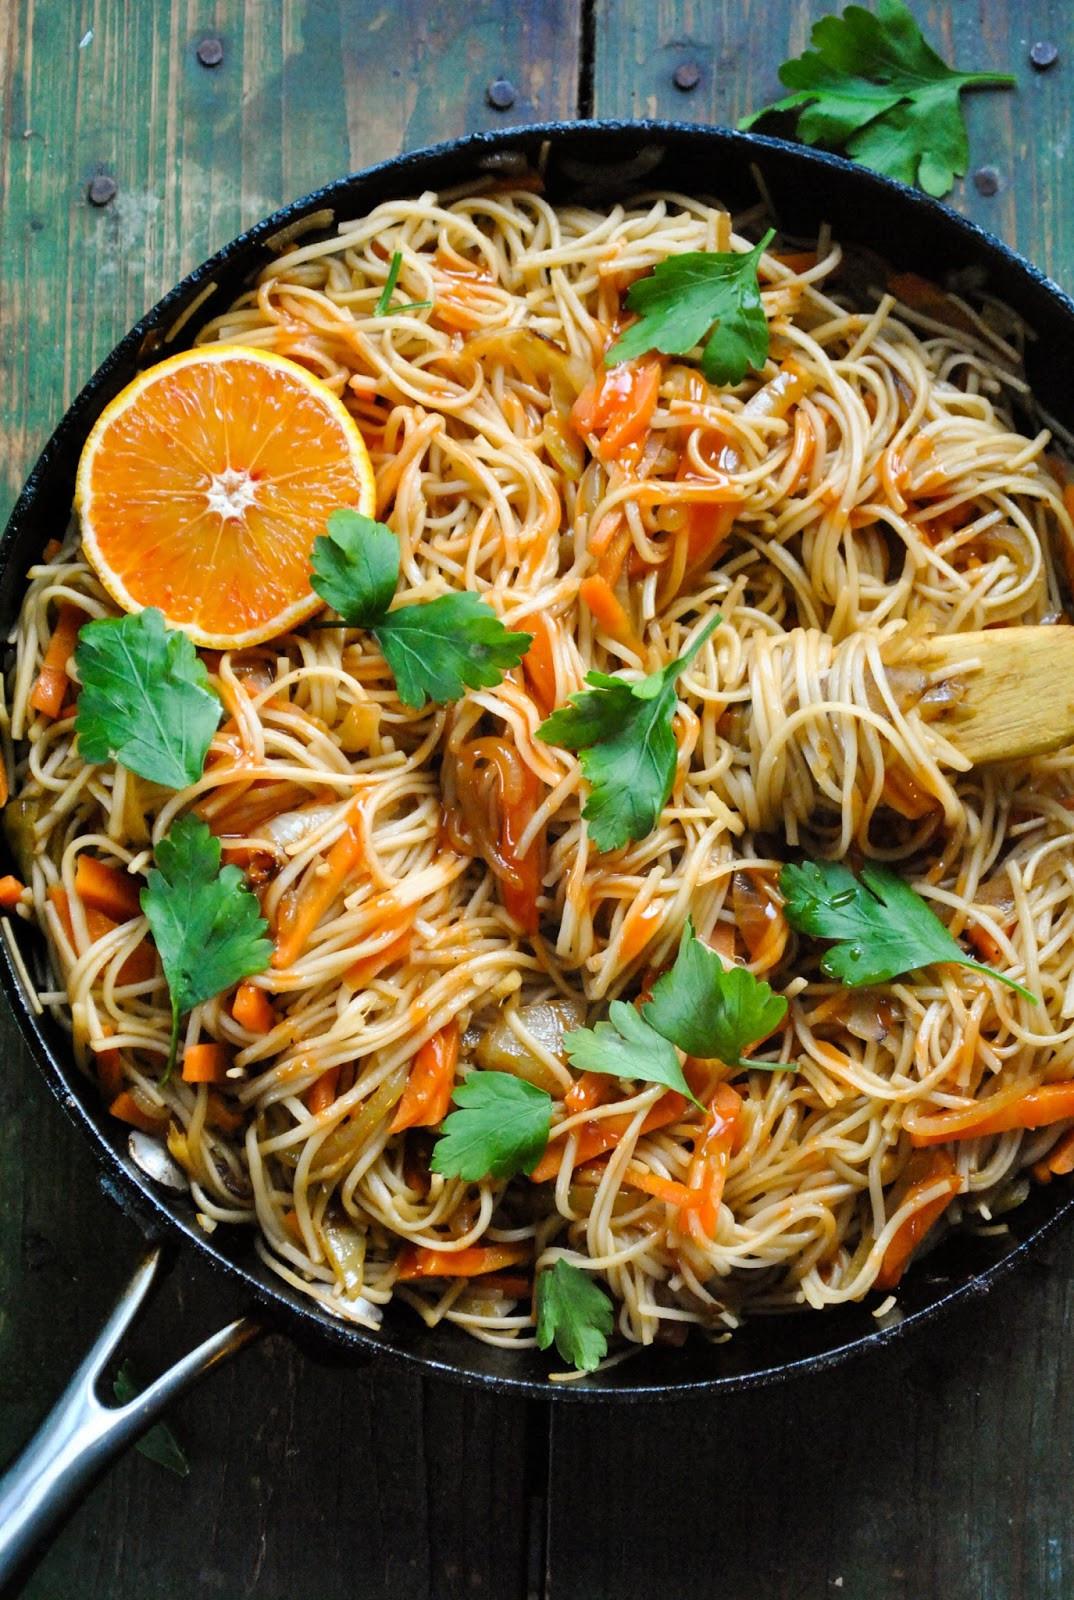 Vegan Recipes Easy  Quick and easy vegan noodle stir fry VeganSandra